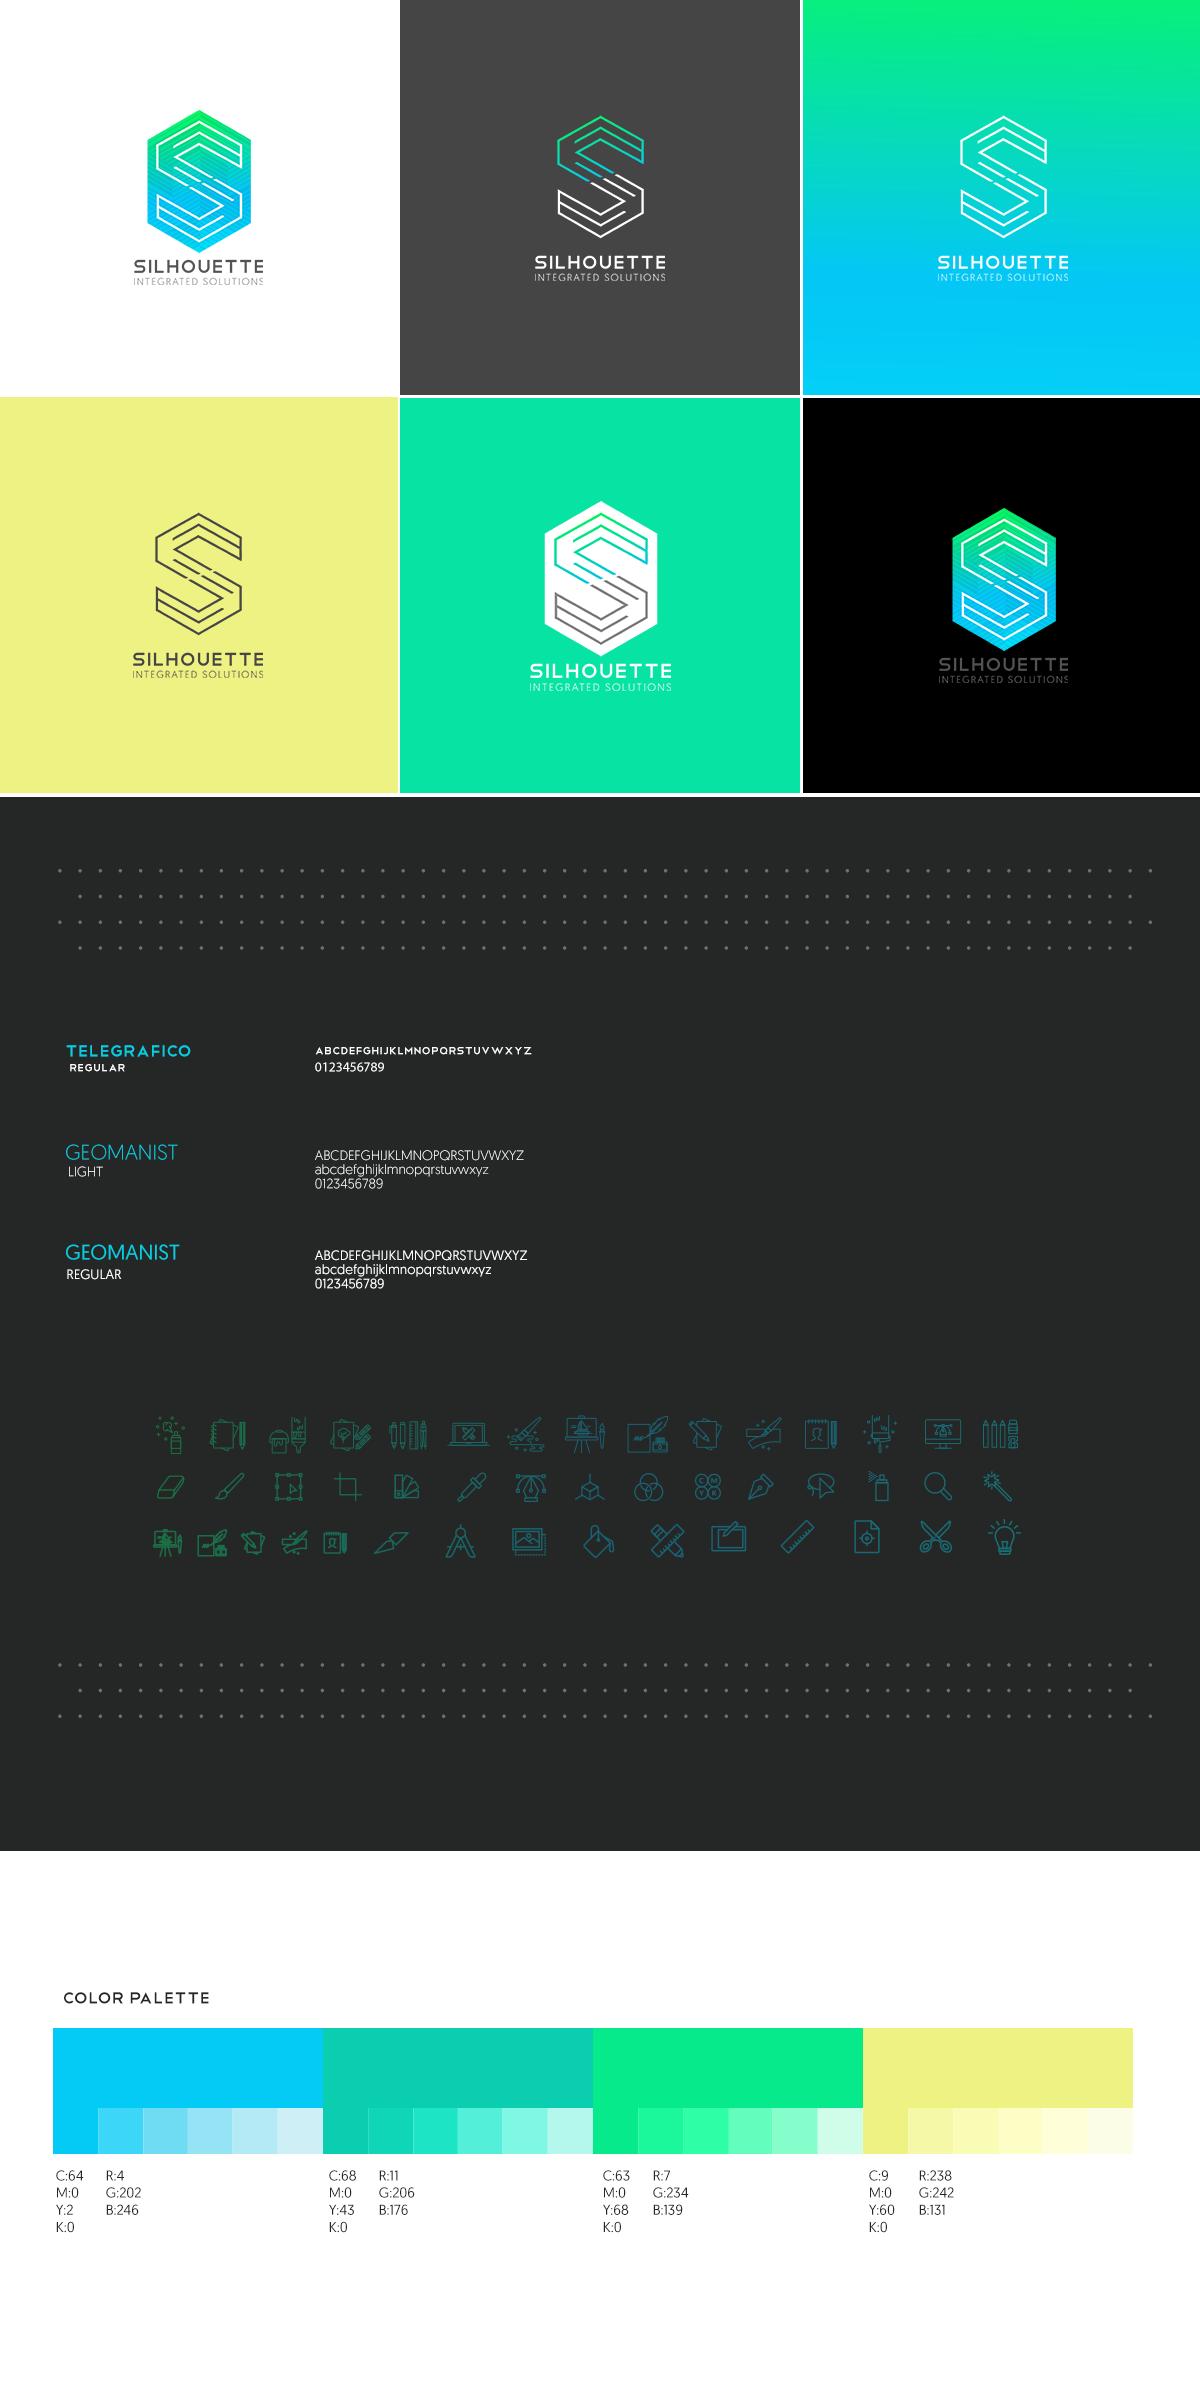 design architucture branding  Silhouette art direction  identity zero-gravity gravity lines